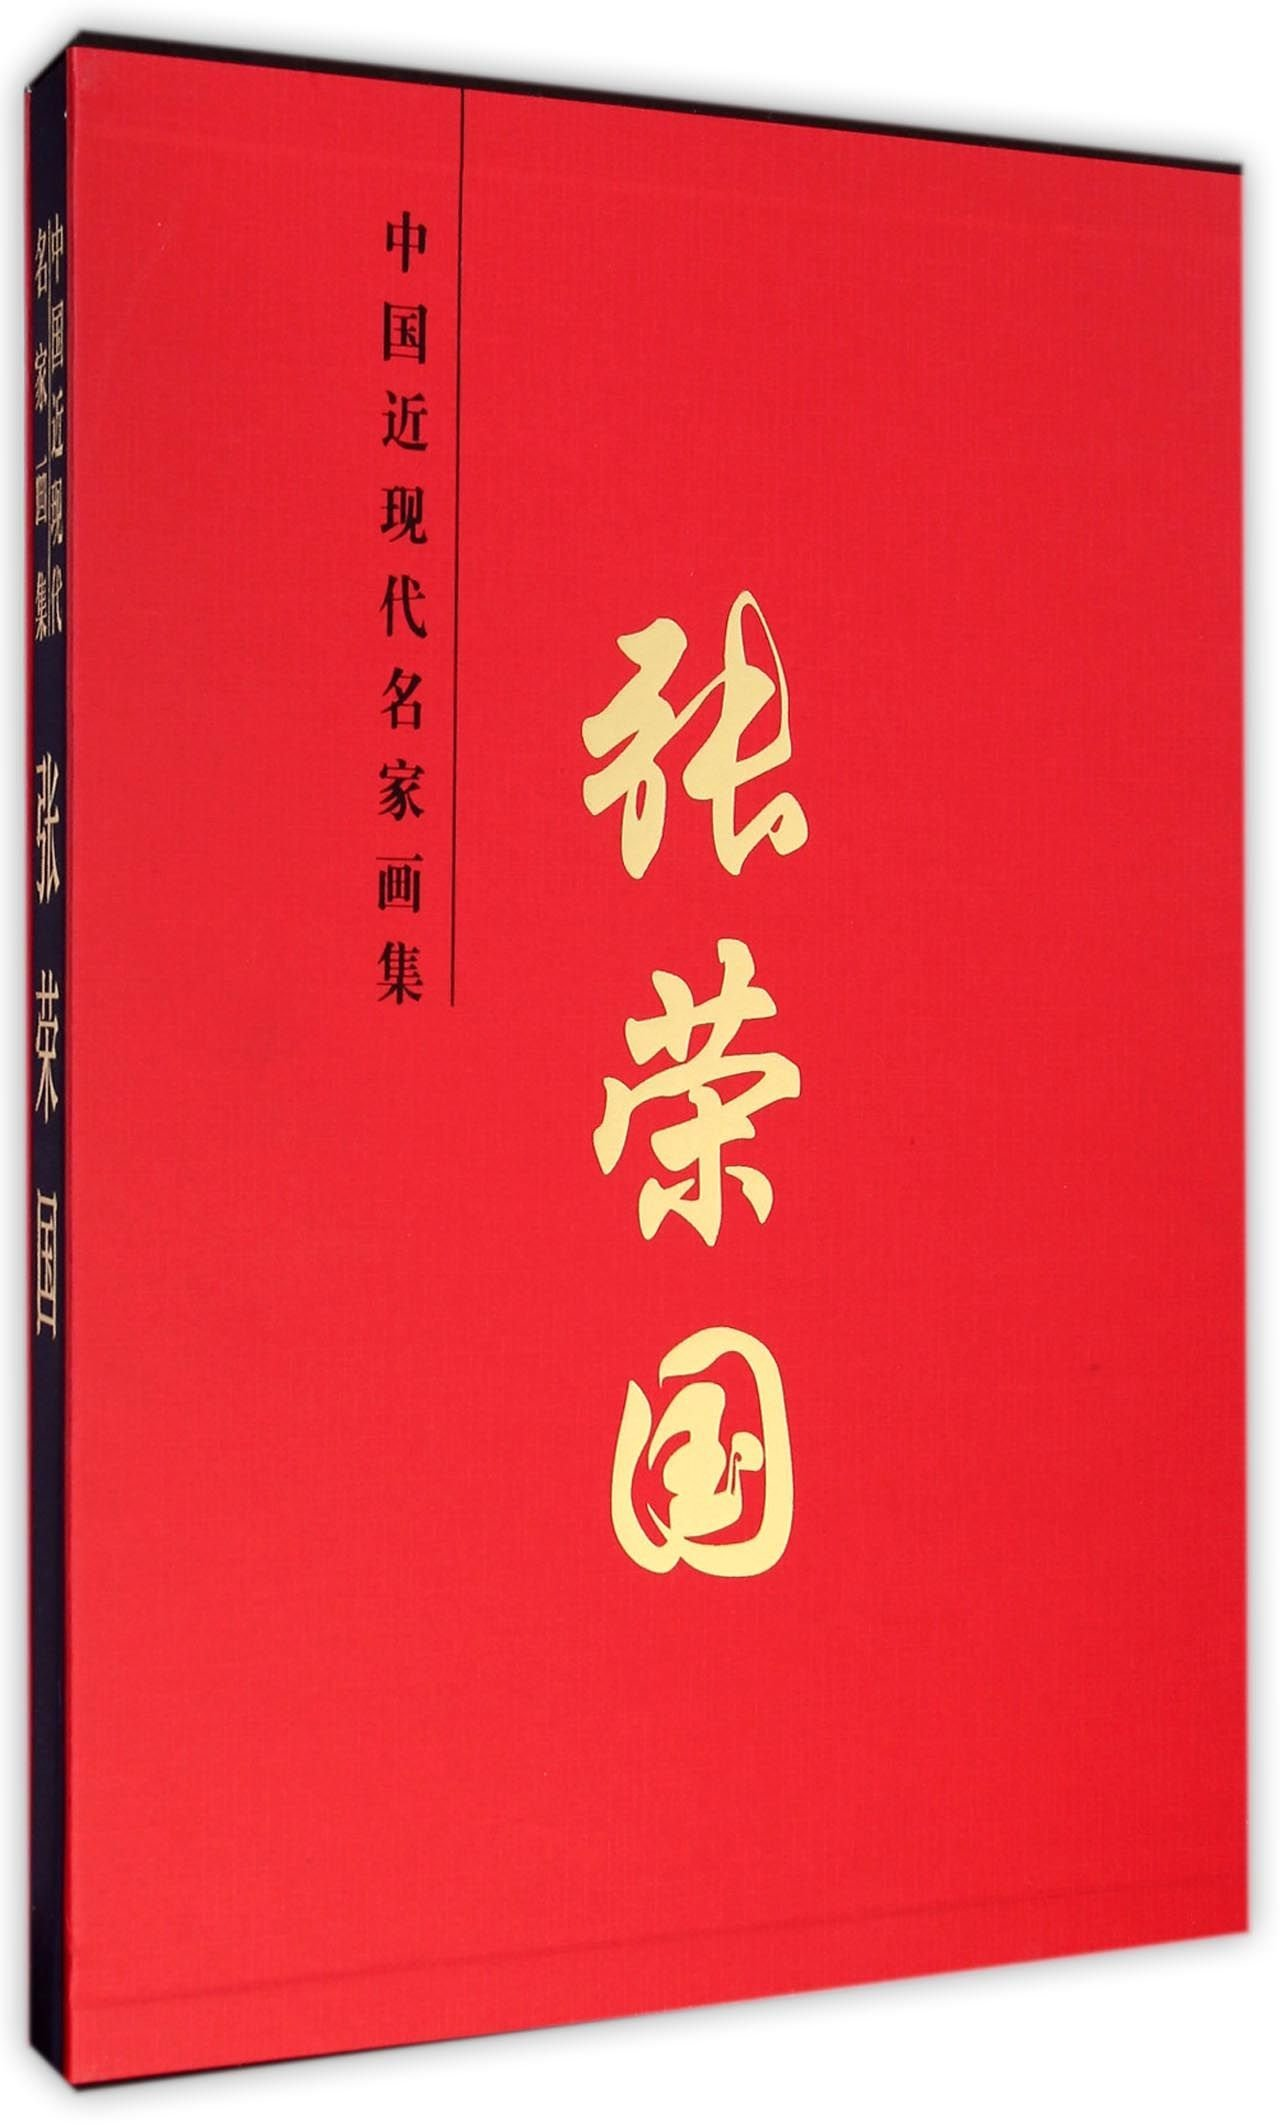 Read Online 张荣国(精)/中国近现代名家画集 ebook